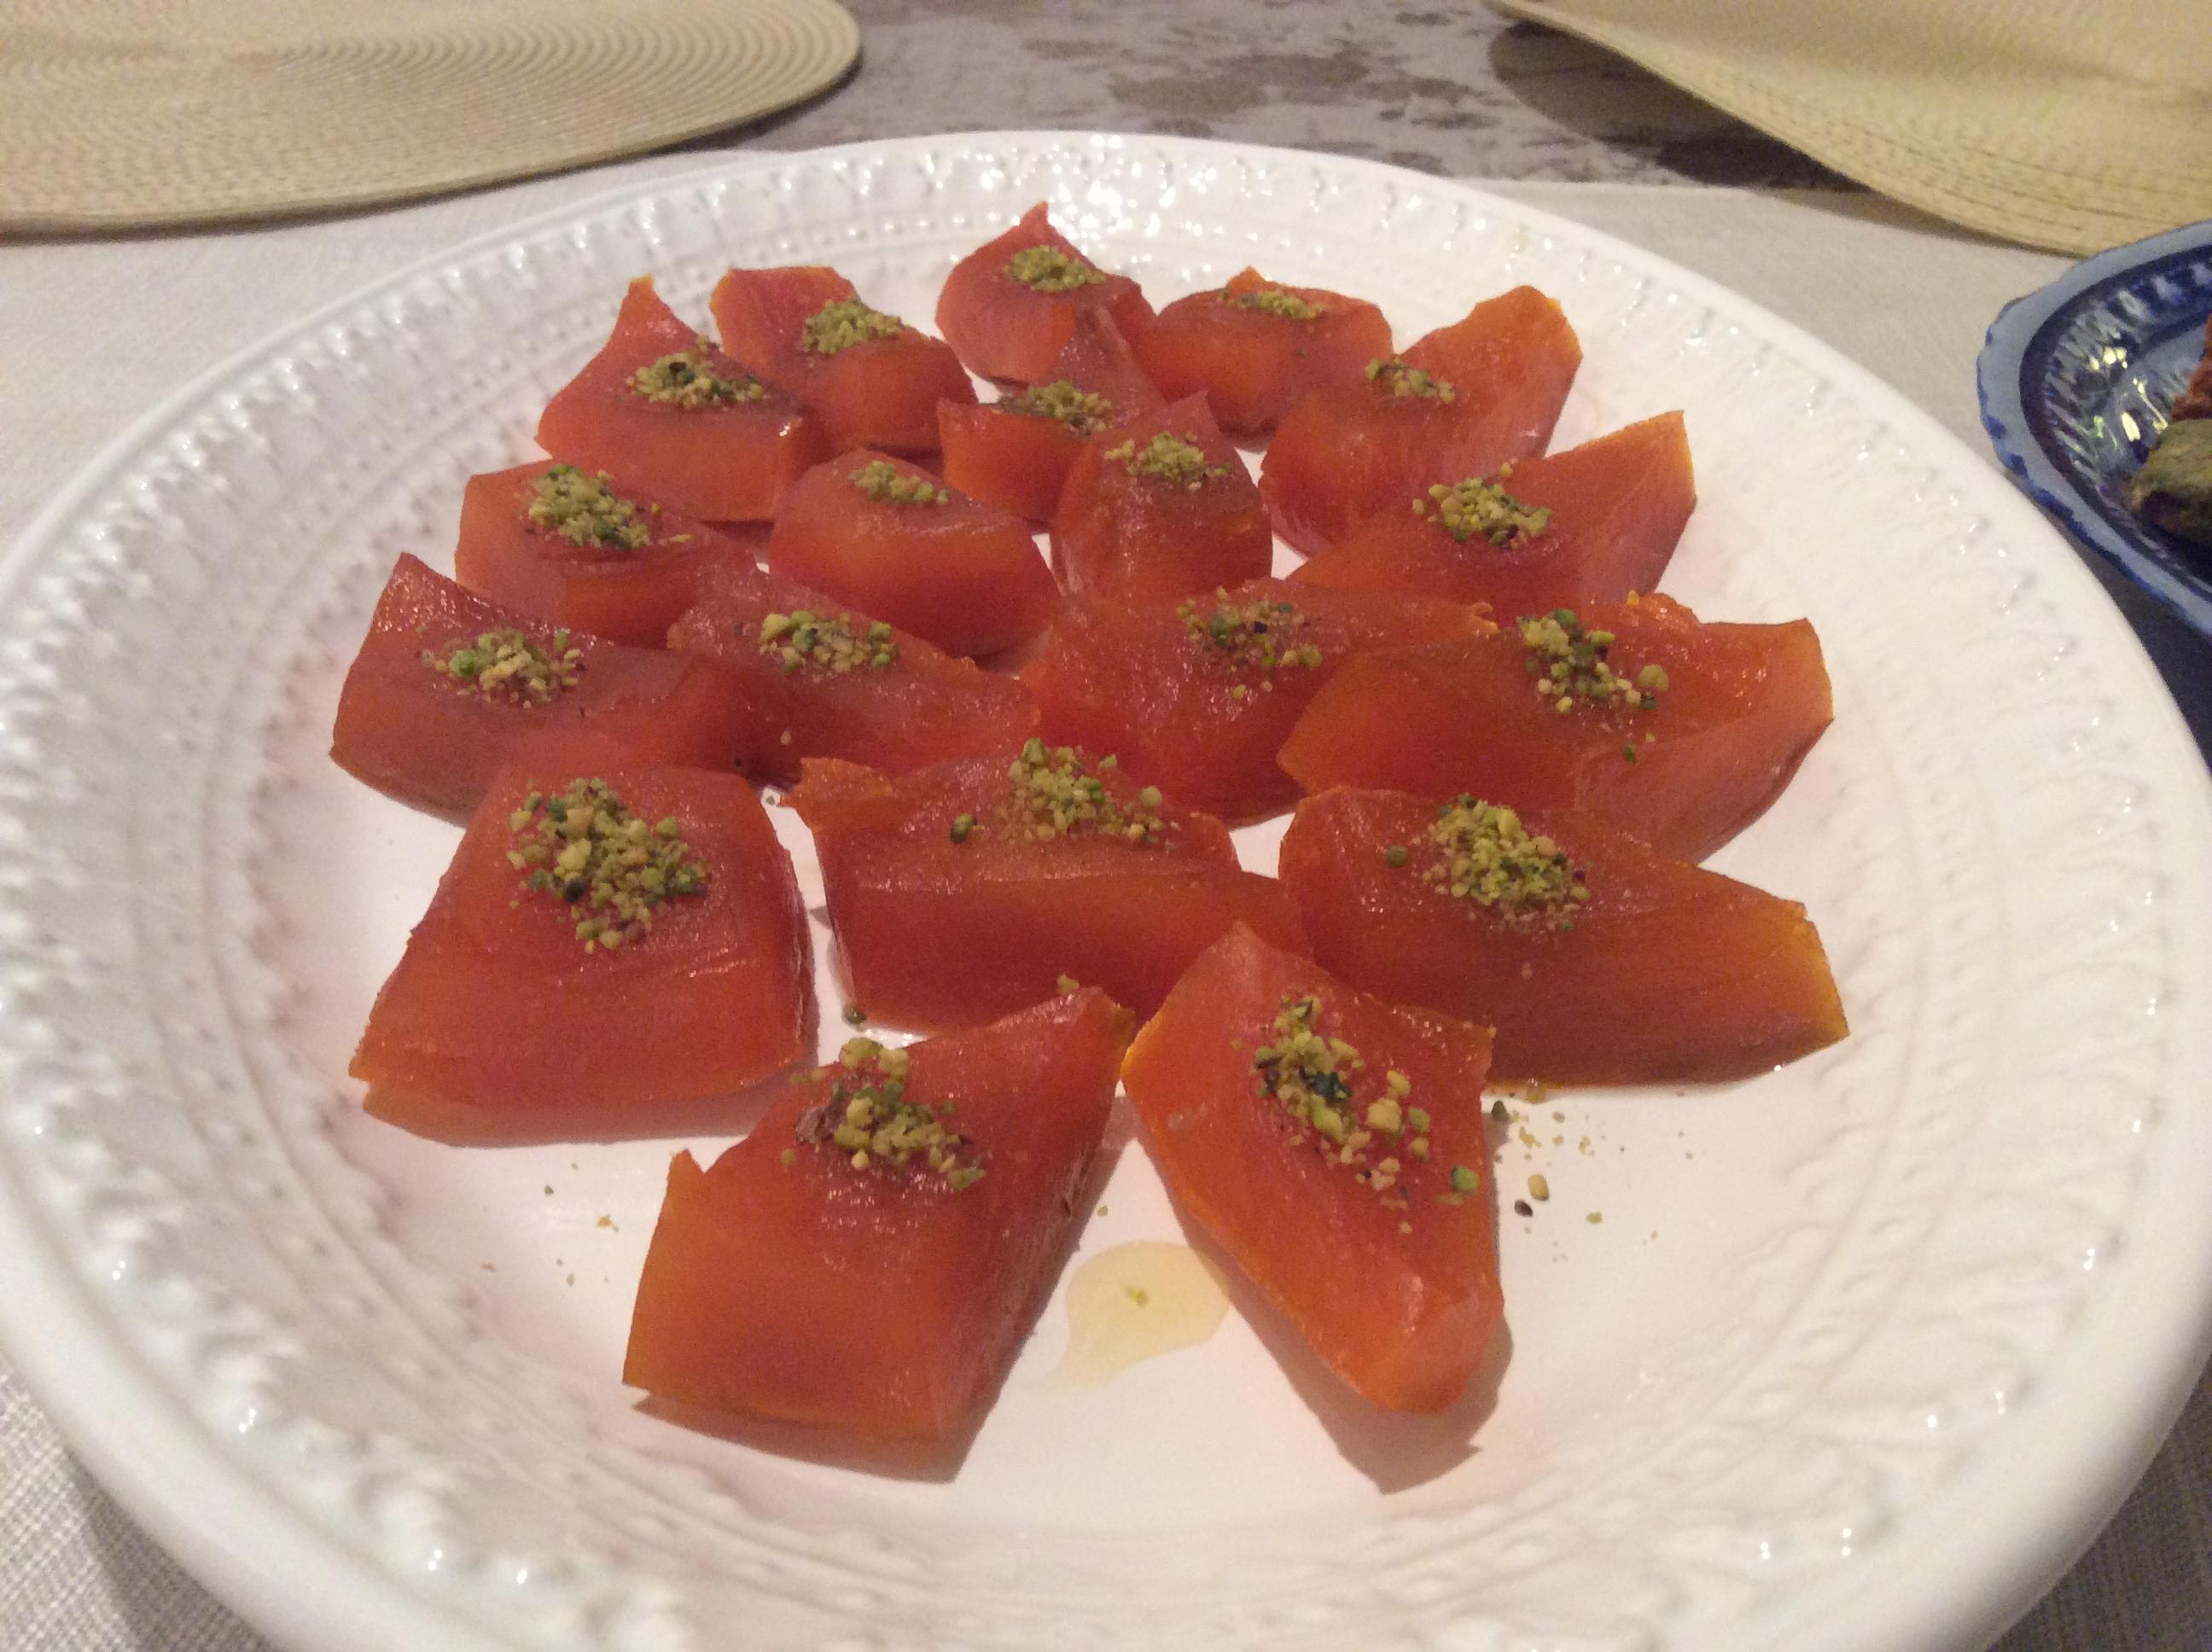 Anatolian cuisine the best turkish cuisine recipes for Anatolian cuisine